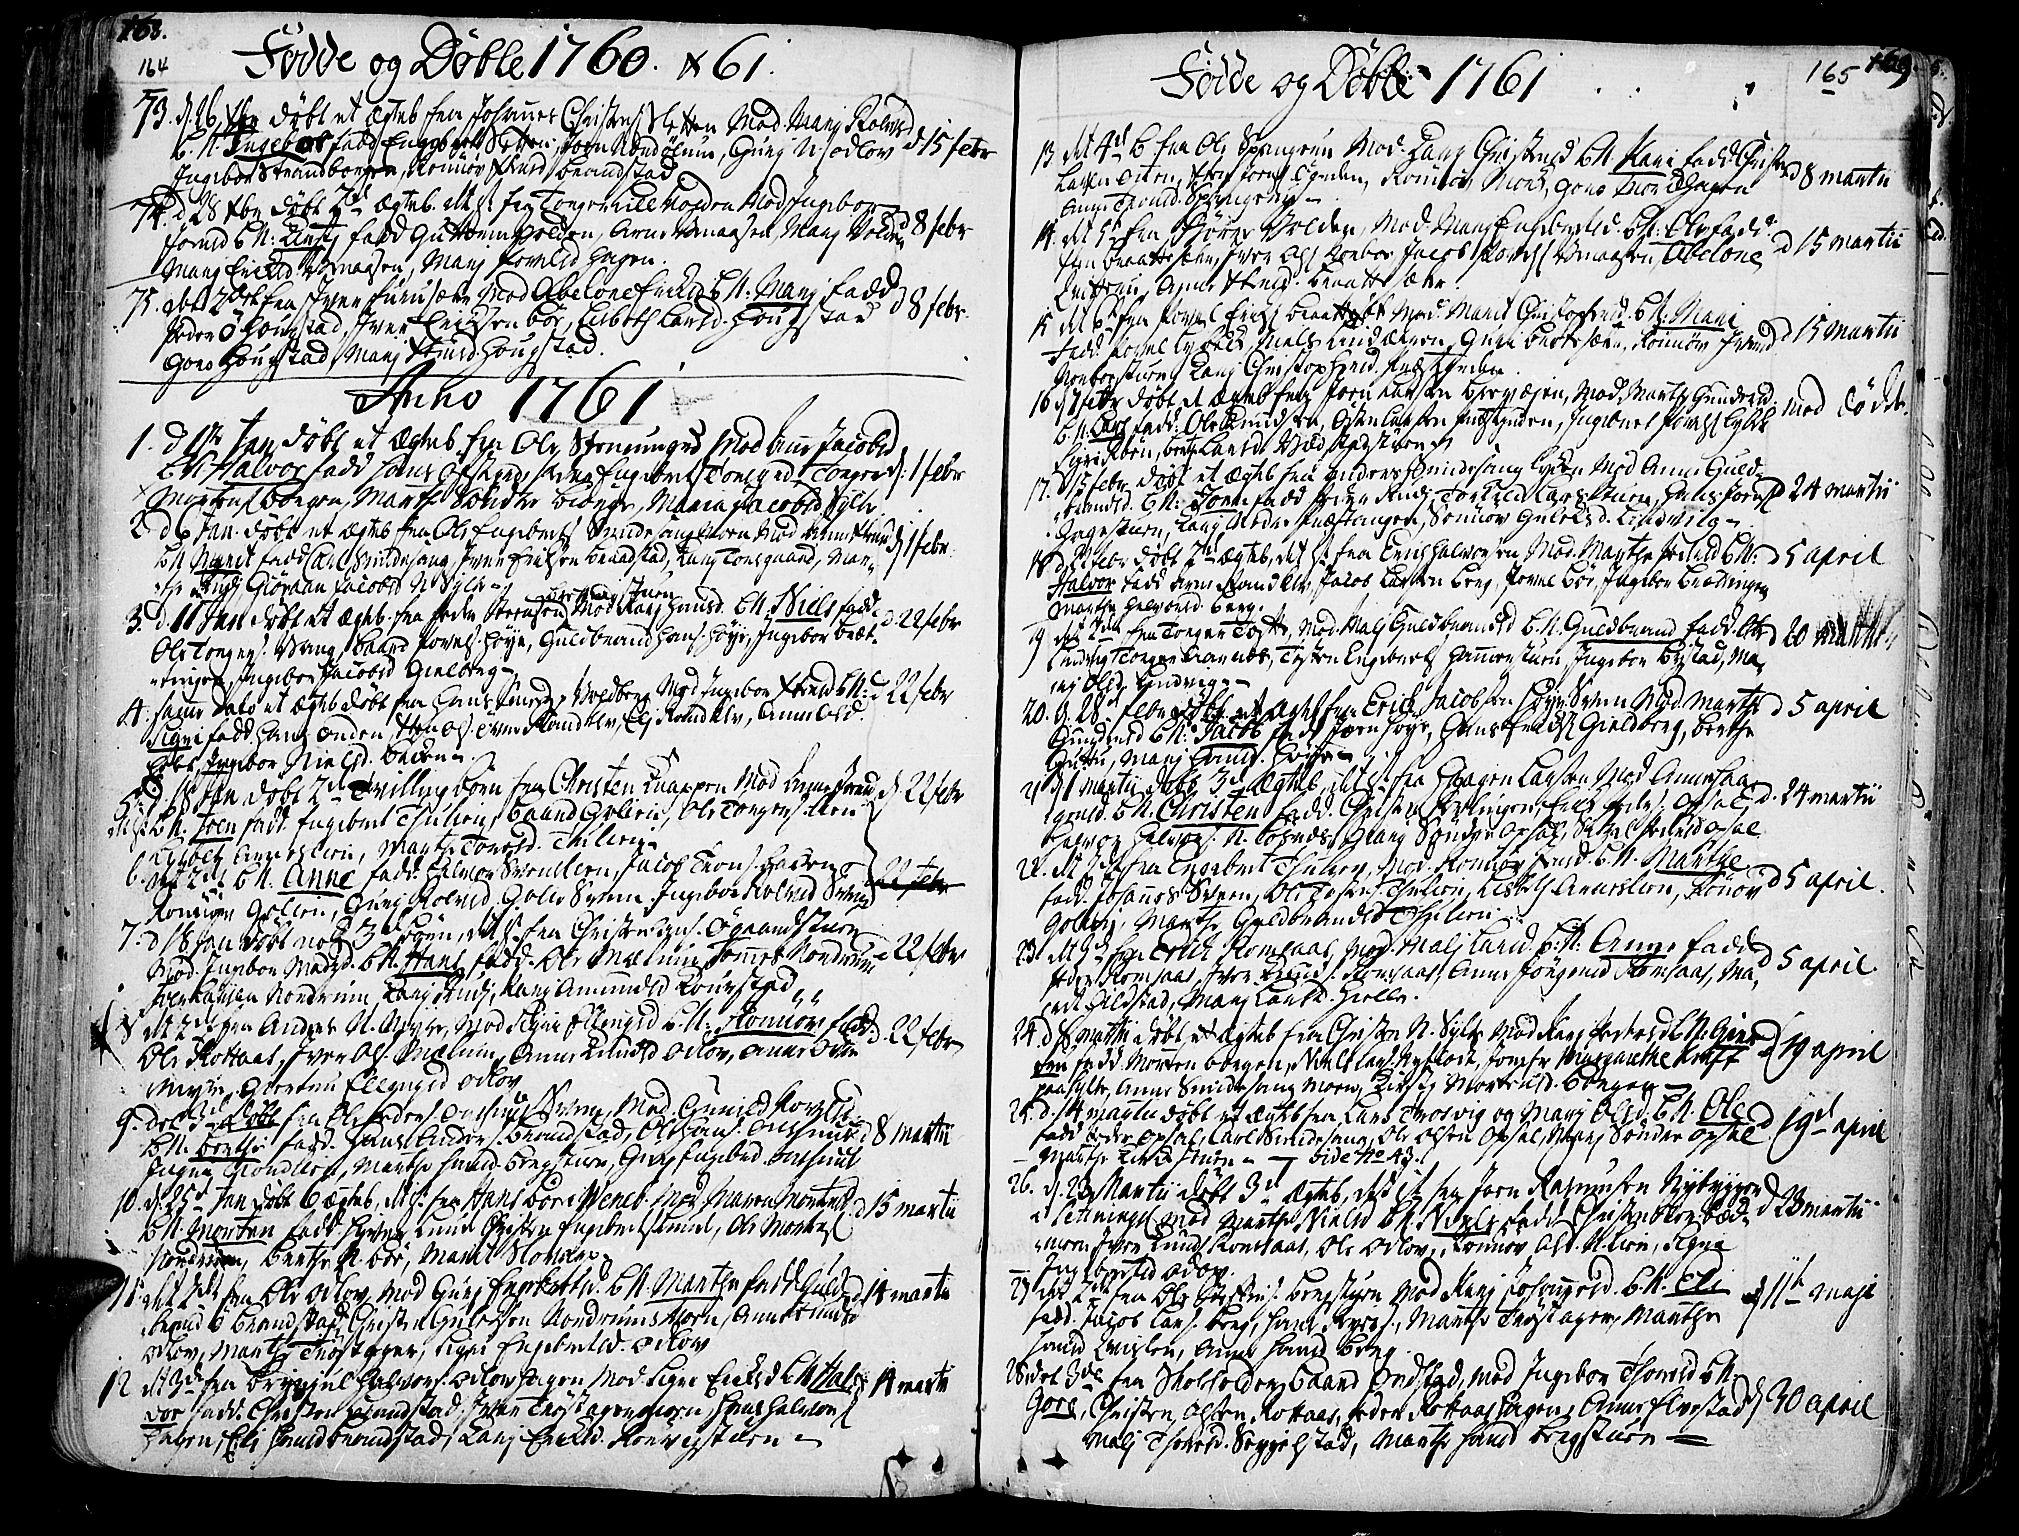 SAH, Ringebu prestekontor, Ministerialbok nr. 2, 1734-1780, s. 164-165